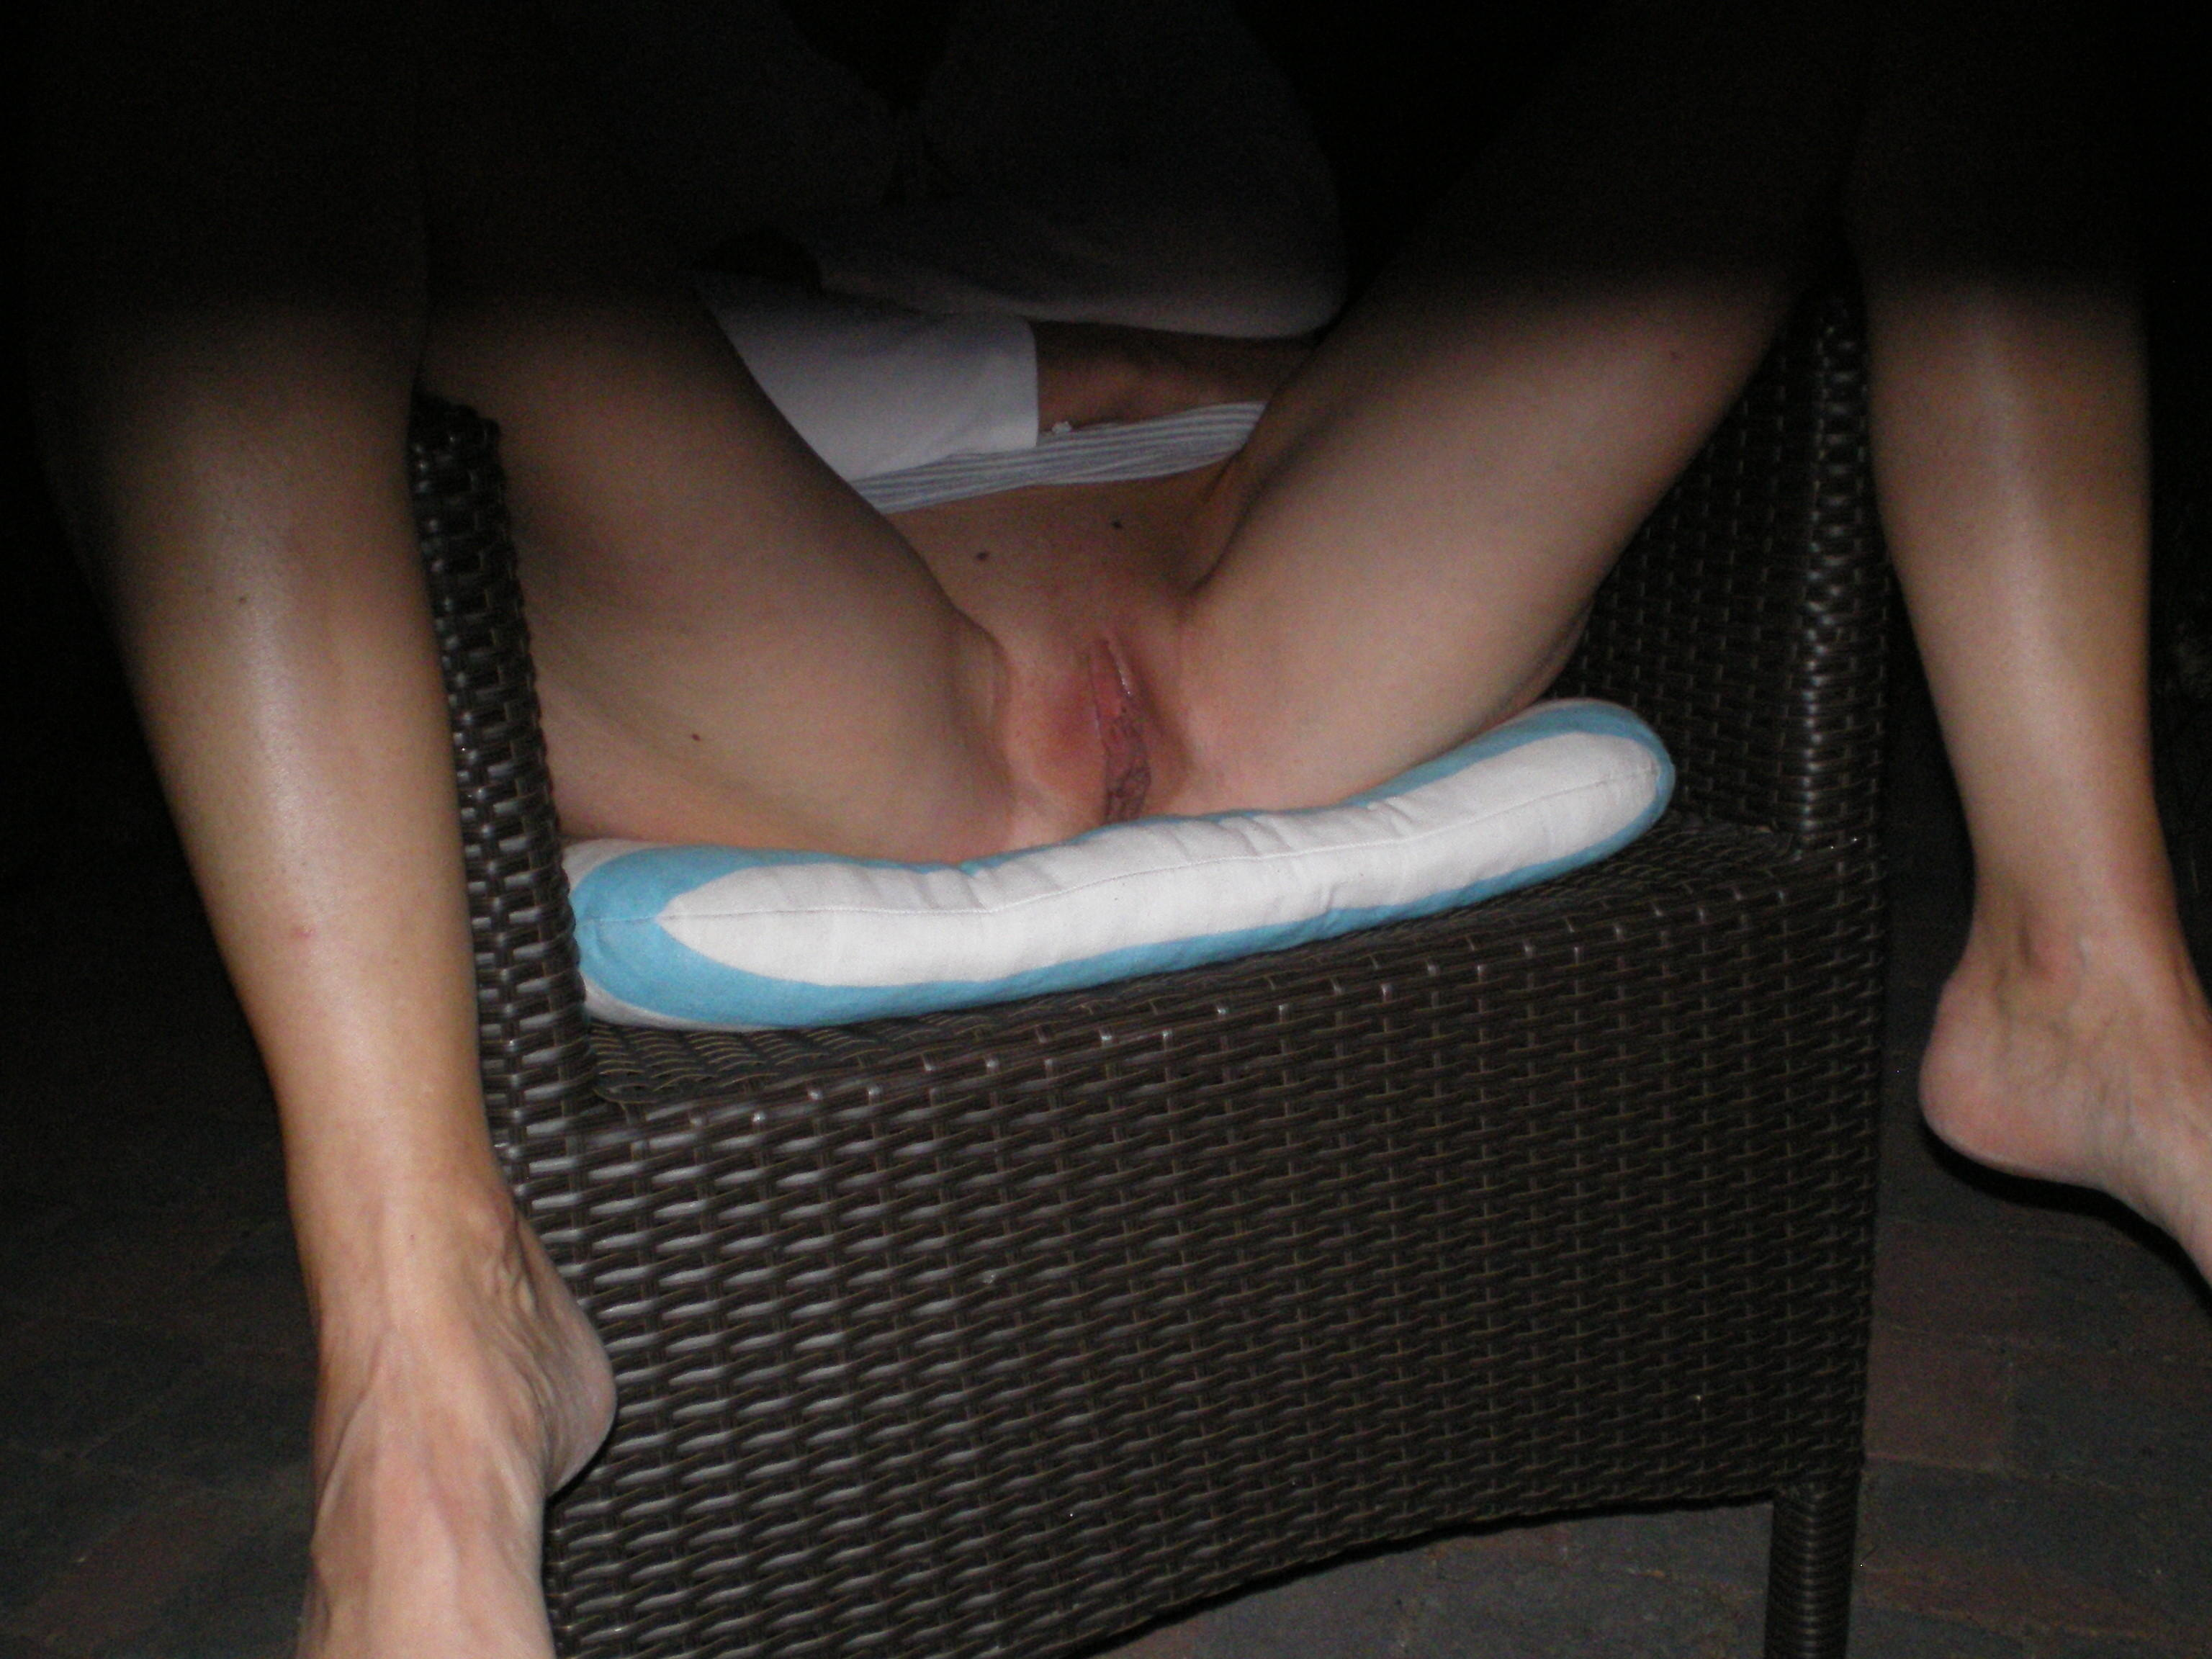 Трахнул кто переложил ногу на ногу без трусиков лесбиянки